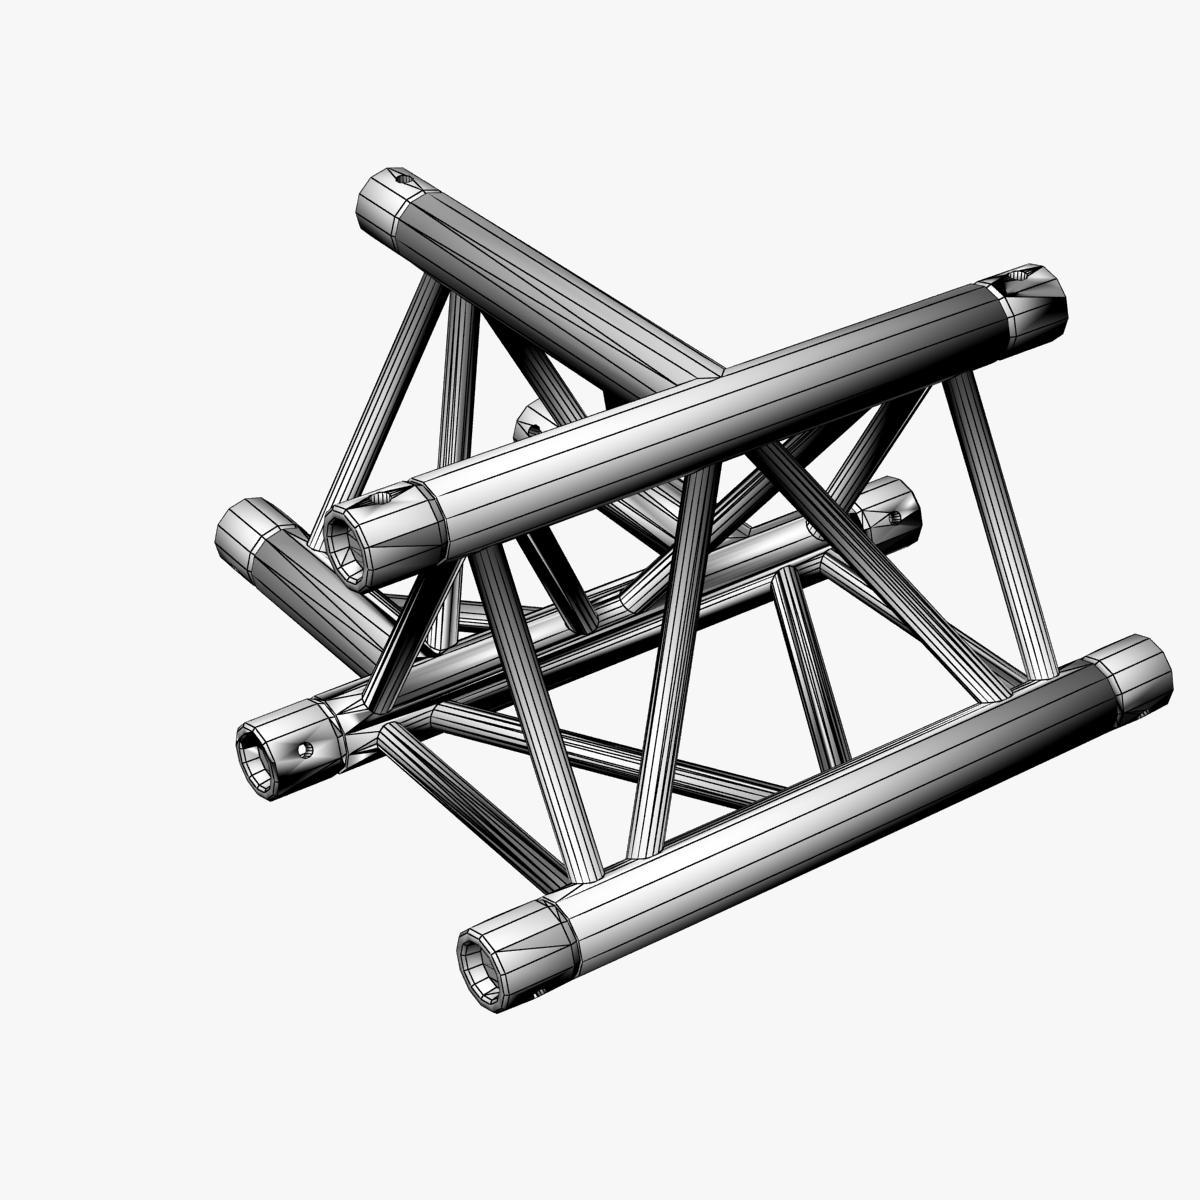 Triangular Truss Cross T Junction 84 3d model 3ds max dxf fbx b3d c4d  obj 268959